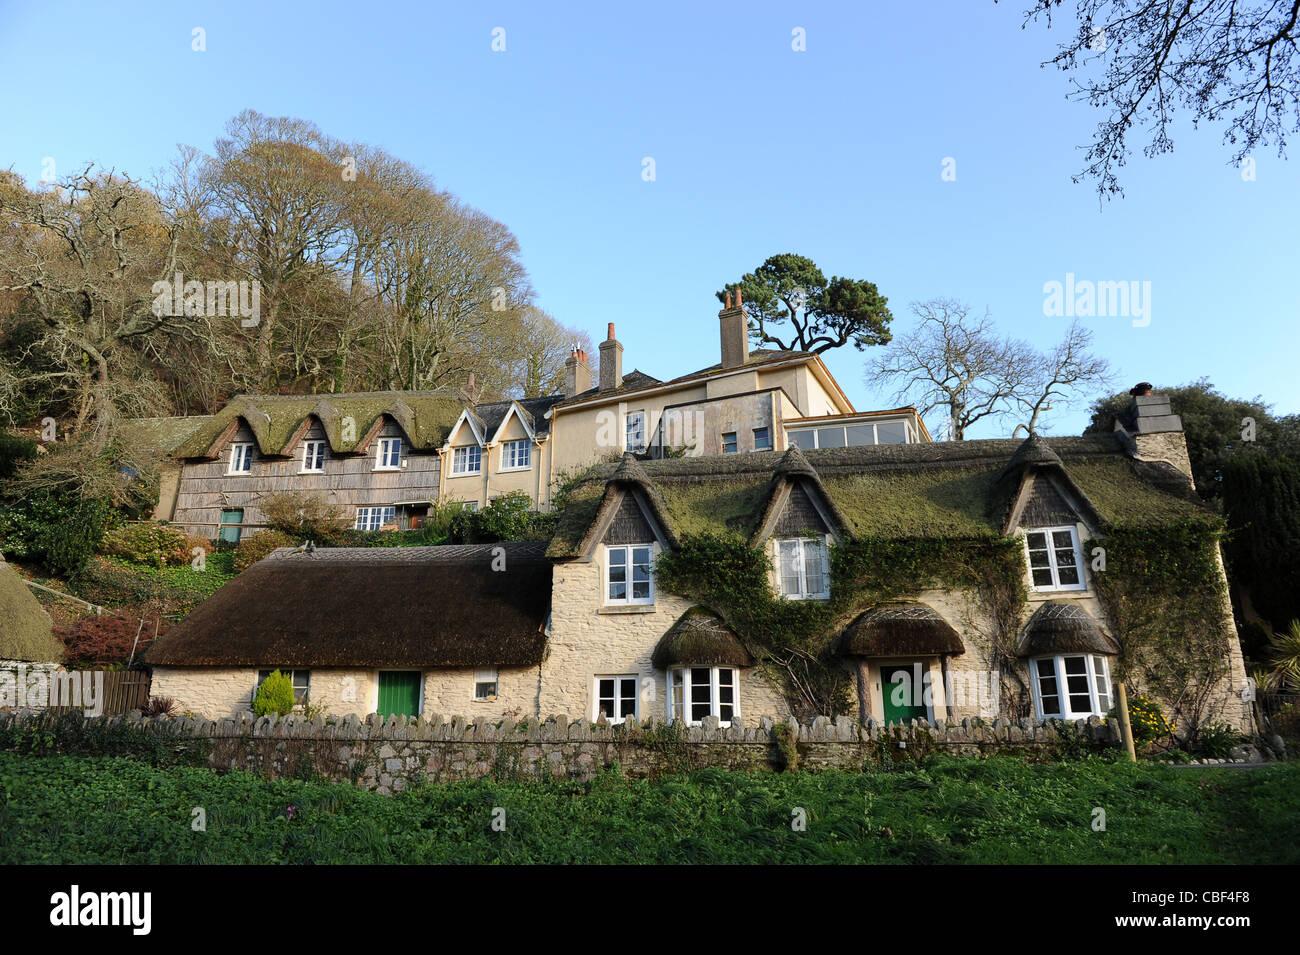 Picturesque cottages near Blackpool Sands South Devon England UK - Stock Image